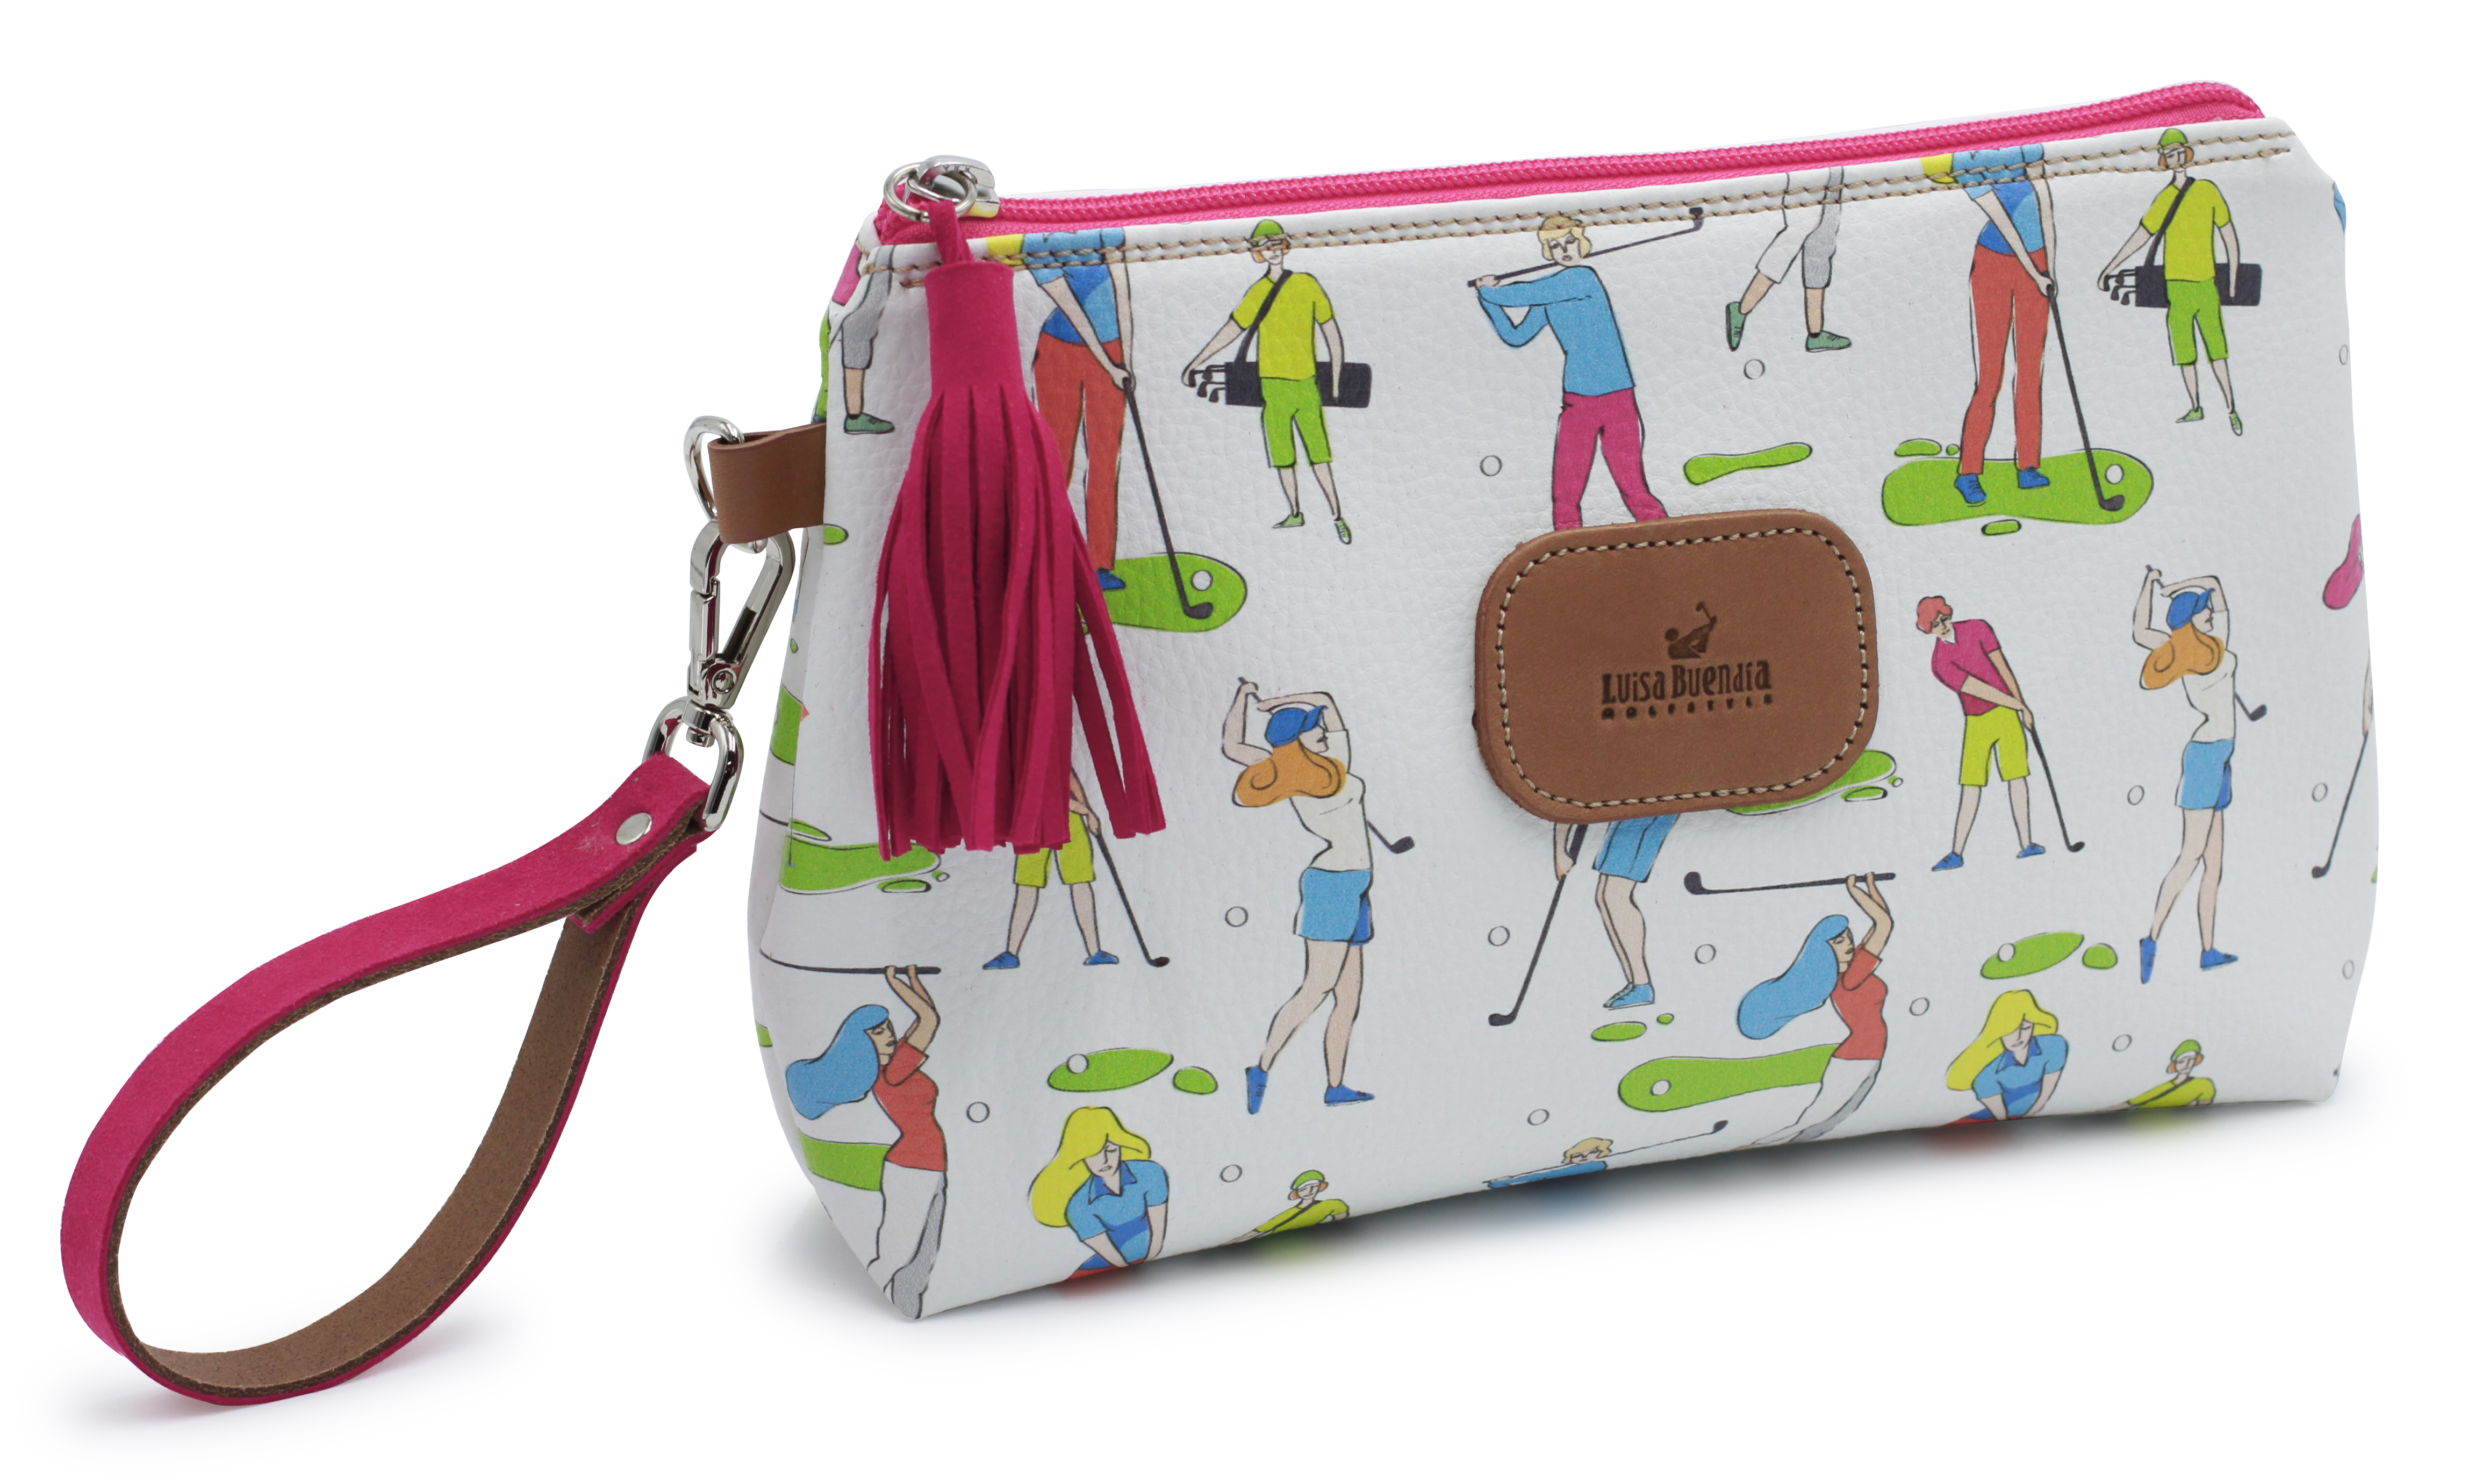 Bag Mod. PR 074